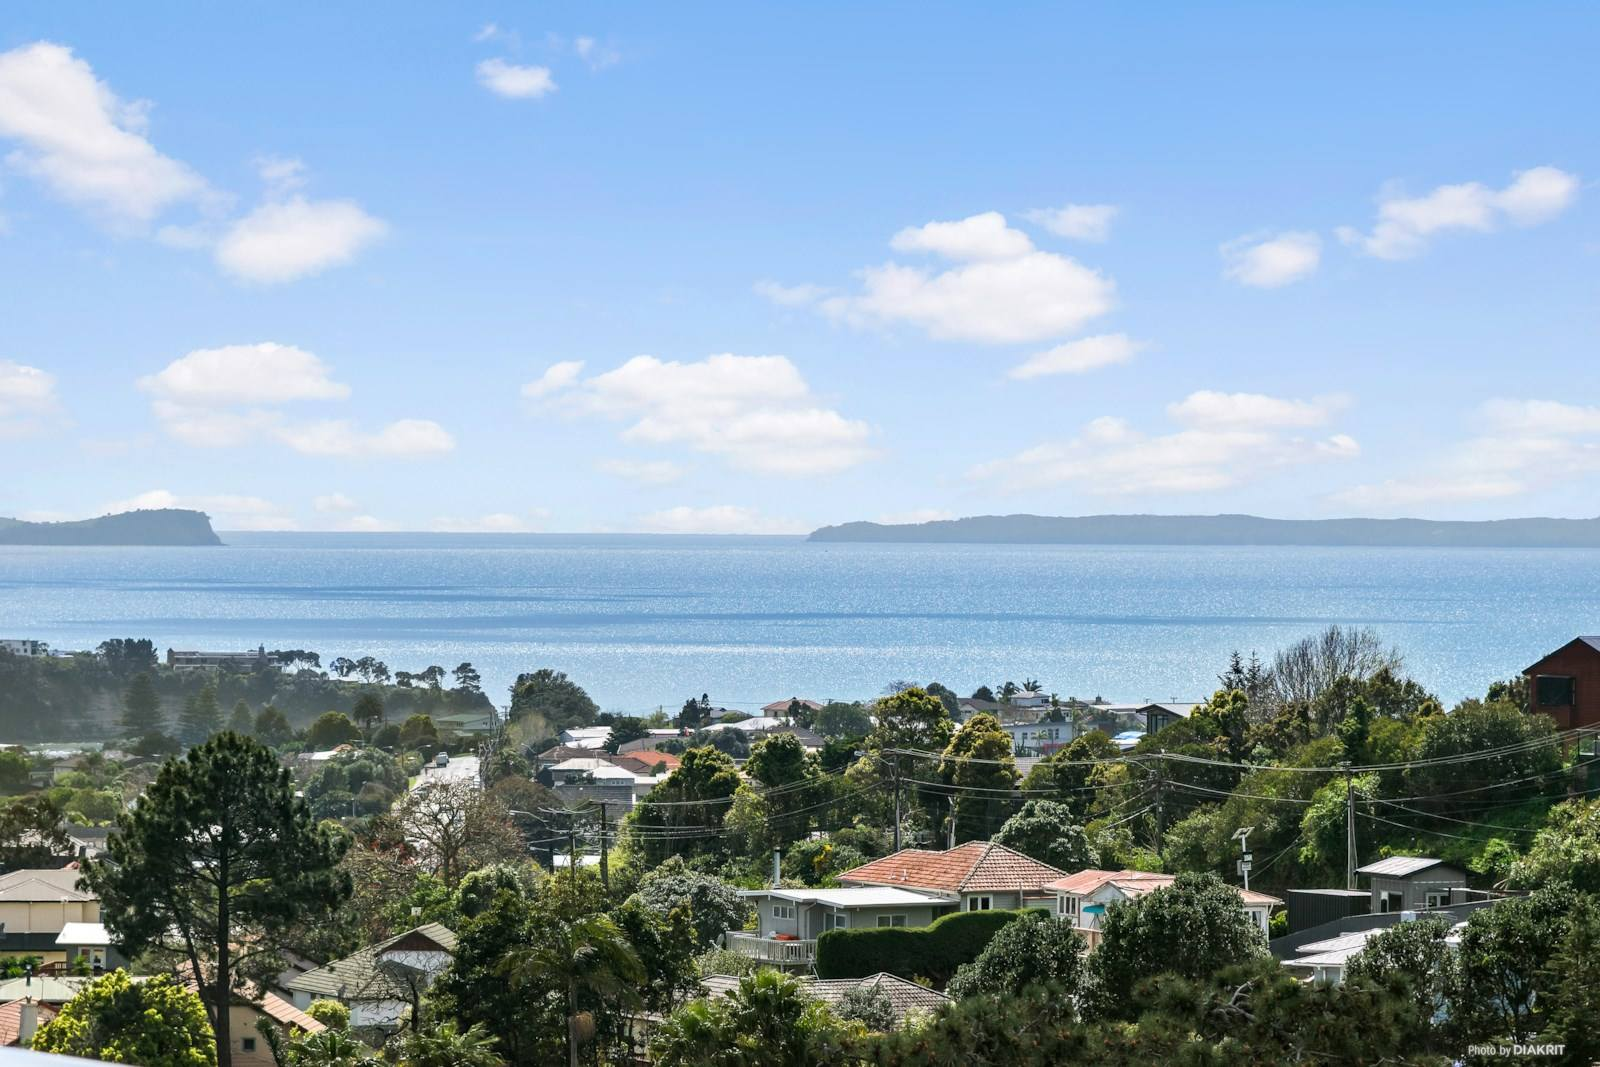 Browns Bay 5房 全新海景私居 饱览灌木风光 好校云集 靠近商店及海滩 生活自在舒心! Brand New - Sea Views & Privacy